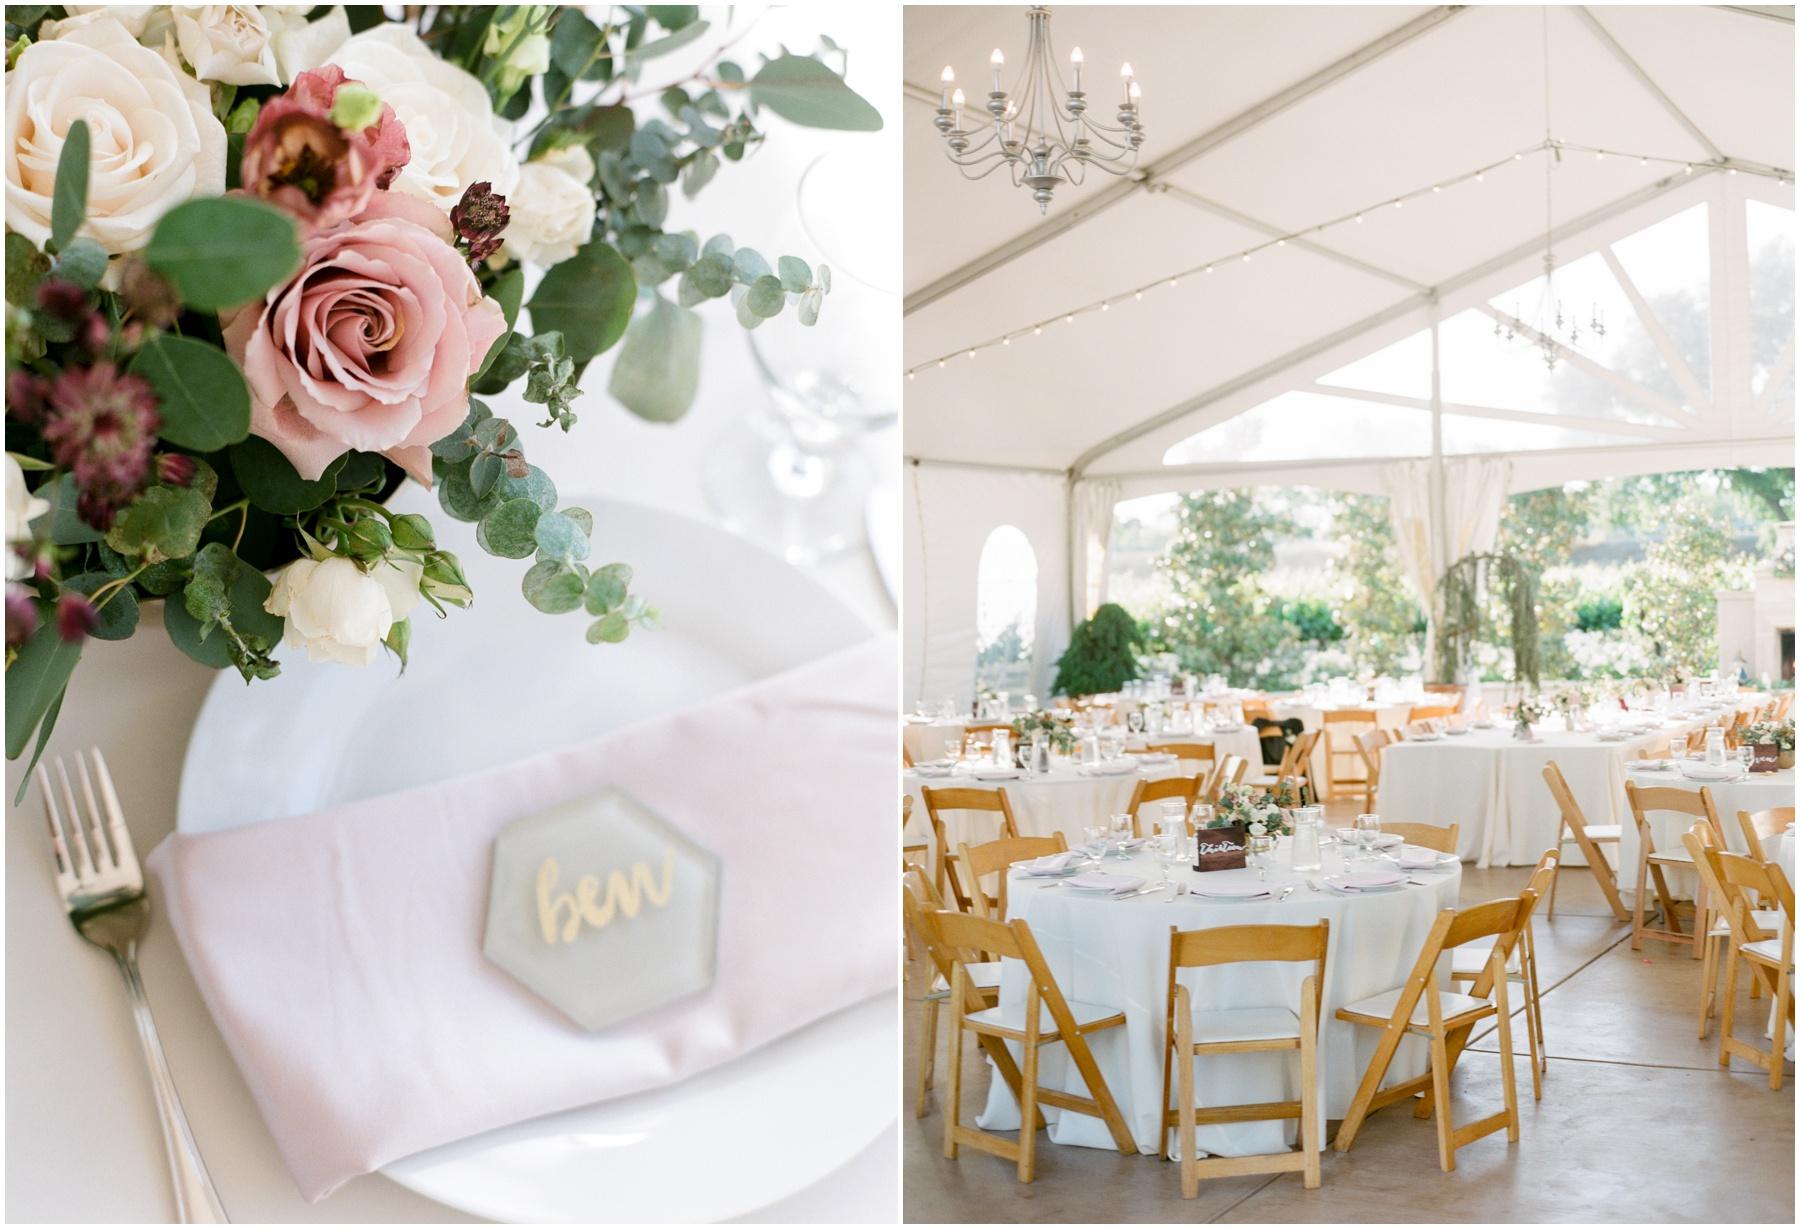 Scribner-bend-vineyards-wedding-sacramento-california-Kristine-Herman-Photography-25.jpg